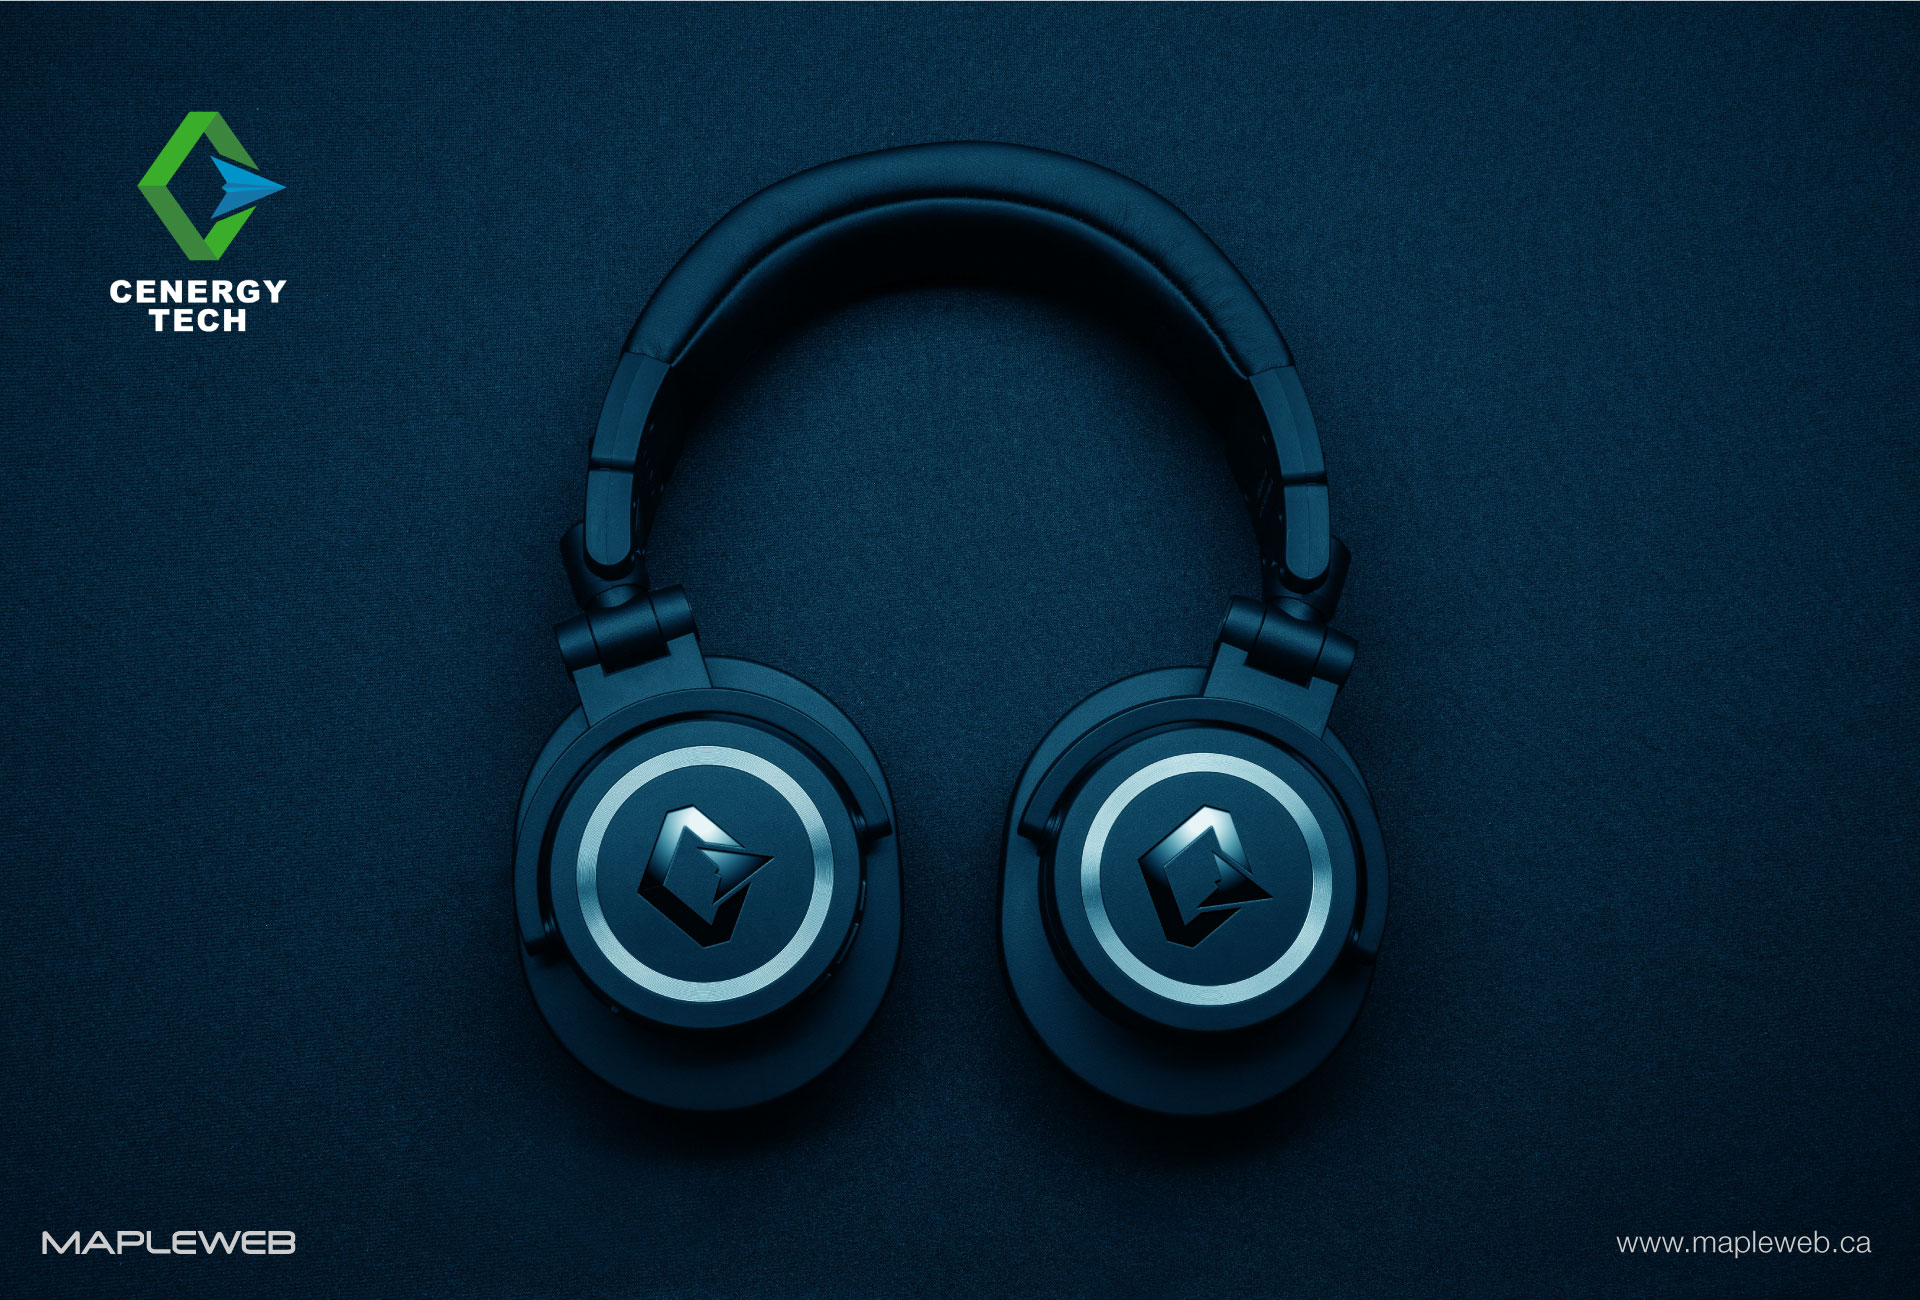 cenergy-tech-brand-logo-design-by-mapleweb-vancouver-canada-headphone-mock